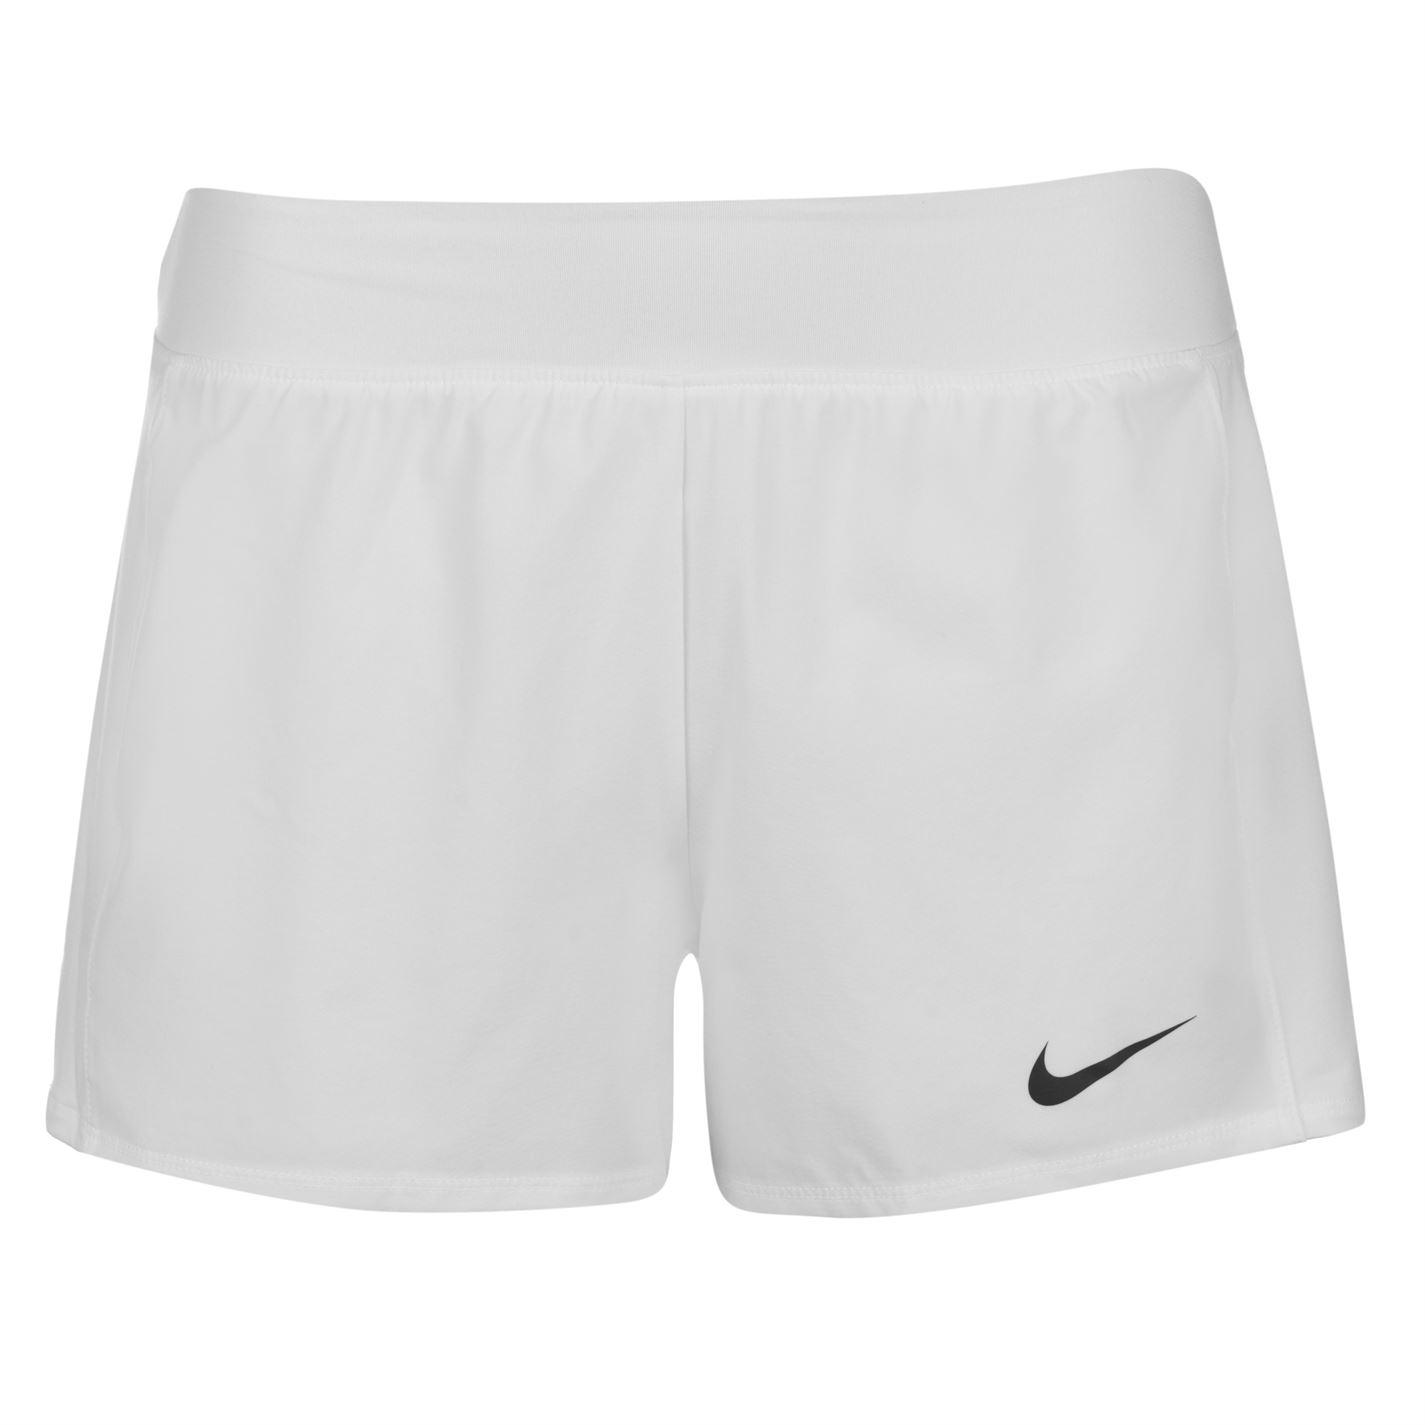 Nike Court Flex Pure Shorts Ladies White Black - Glami.cz 8b0a0a3fea